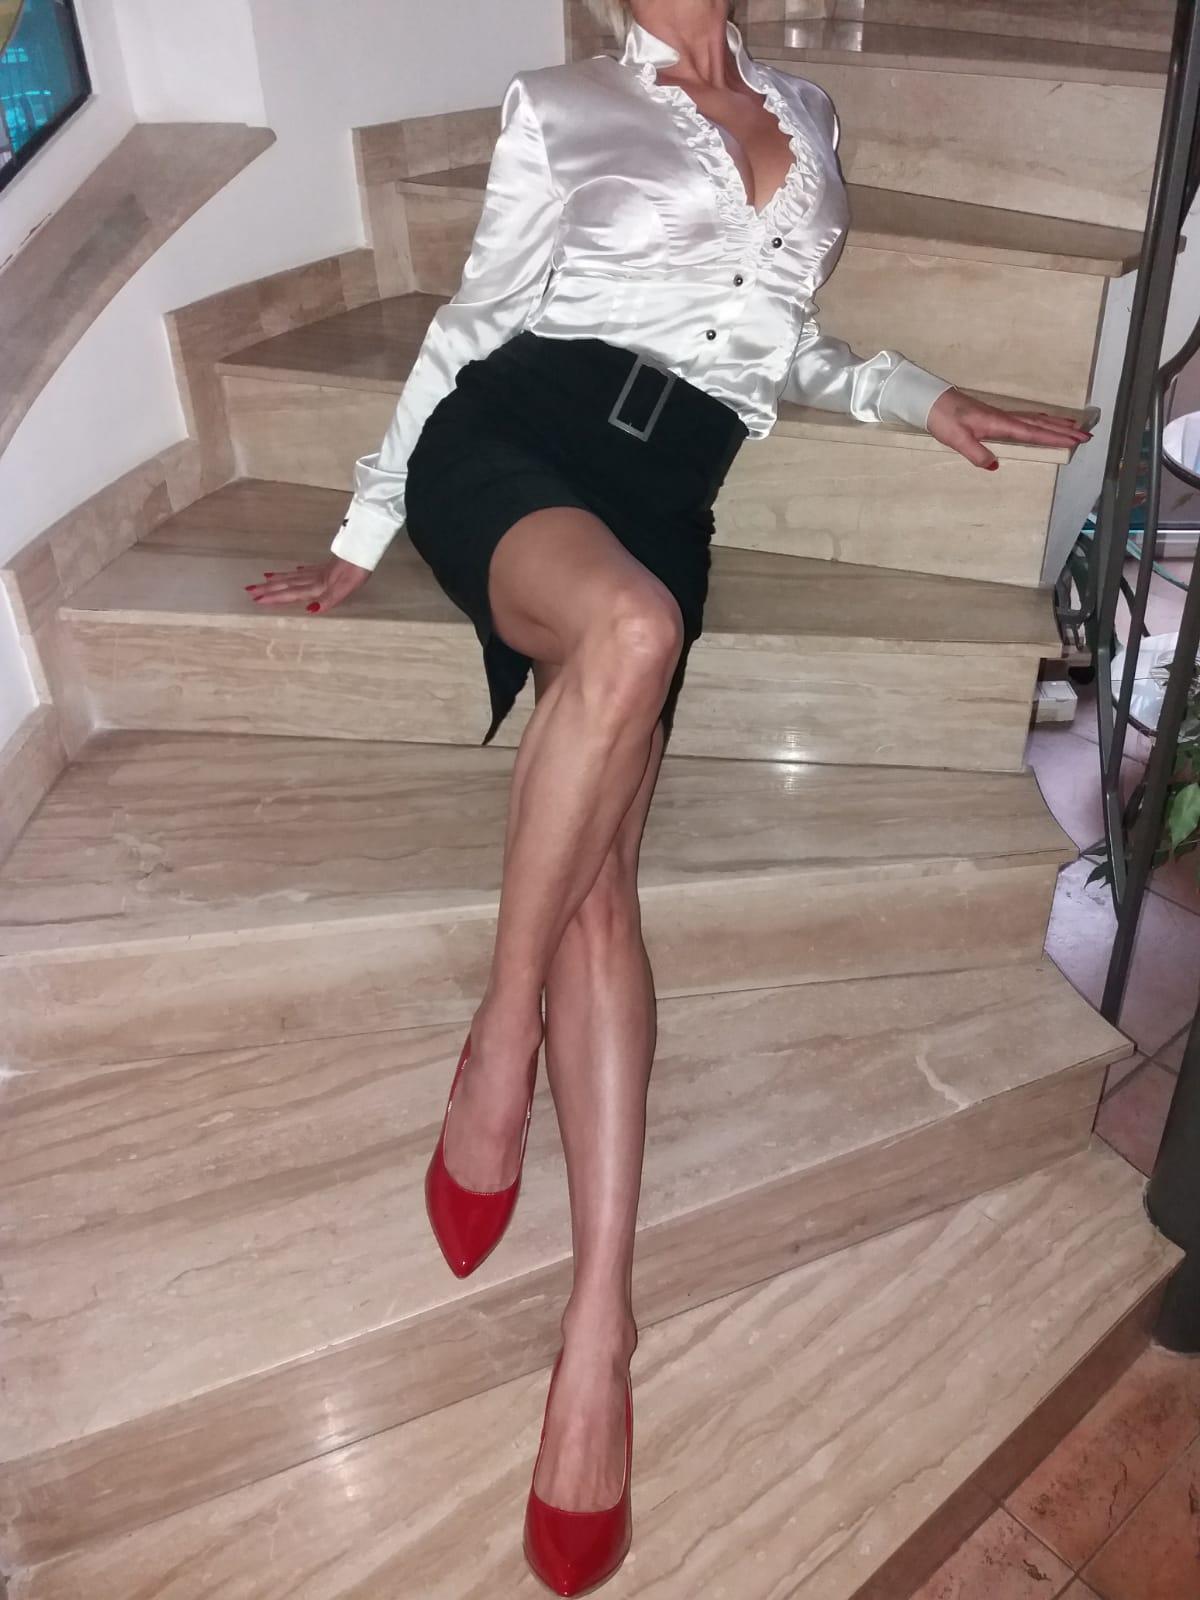 http://masazedomecek.cz/wp-content/uploads/2019/11/Diana-4-ano.jpg